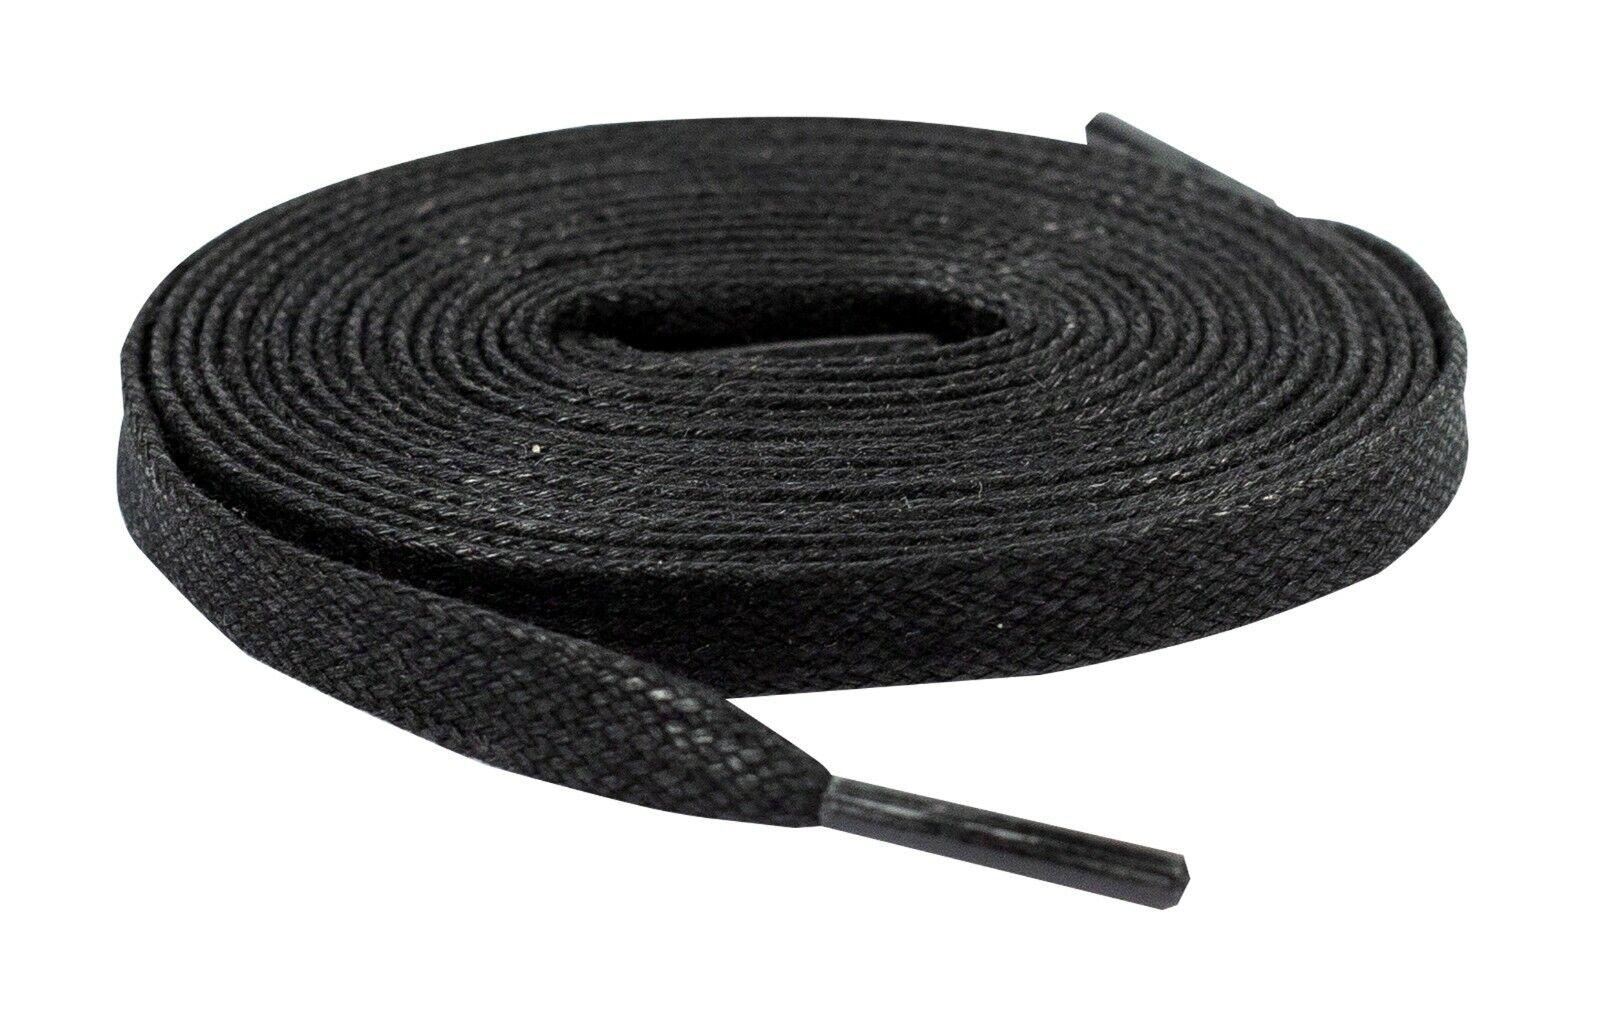 Premium FLAT WAX SHOE LACES JORDAN NIKE Asics NMD supreme Black Lace Envy Clothing & Shoe Care